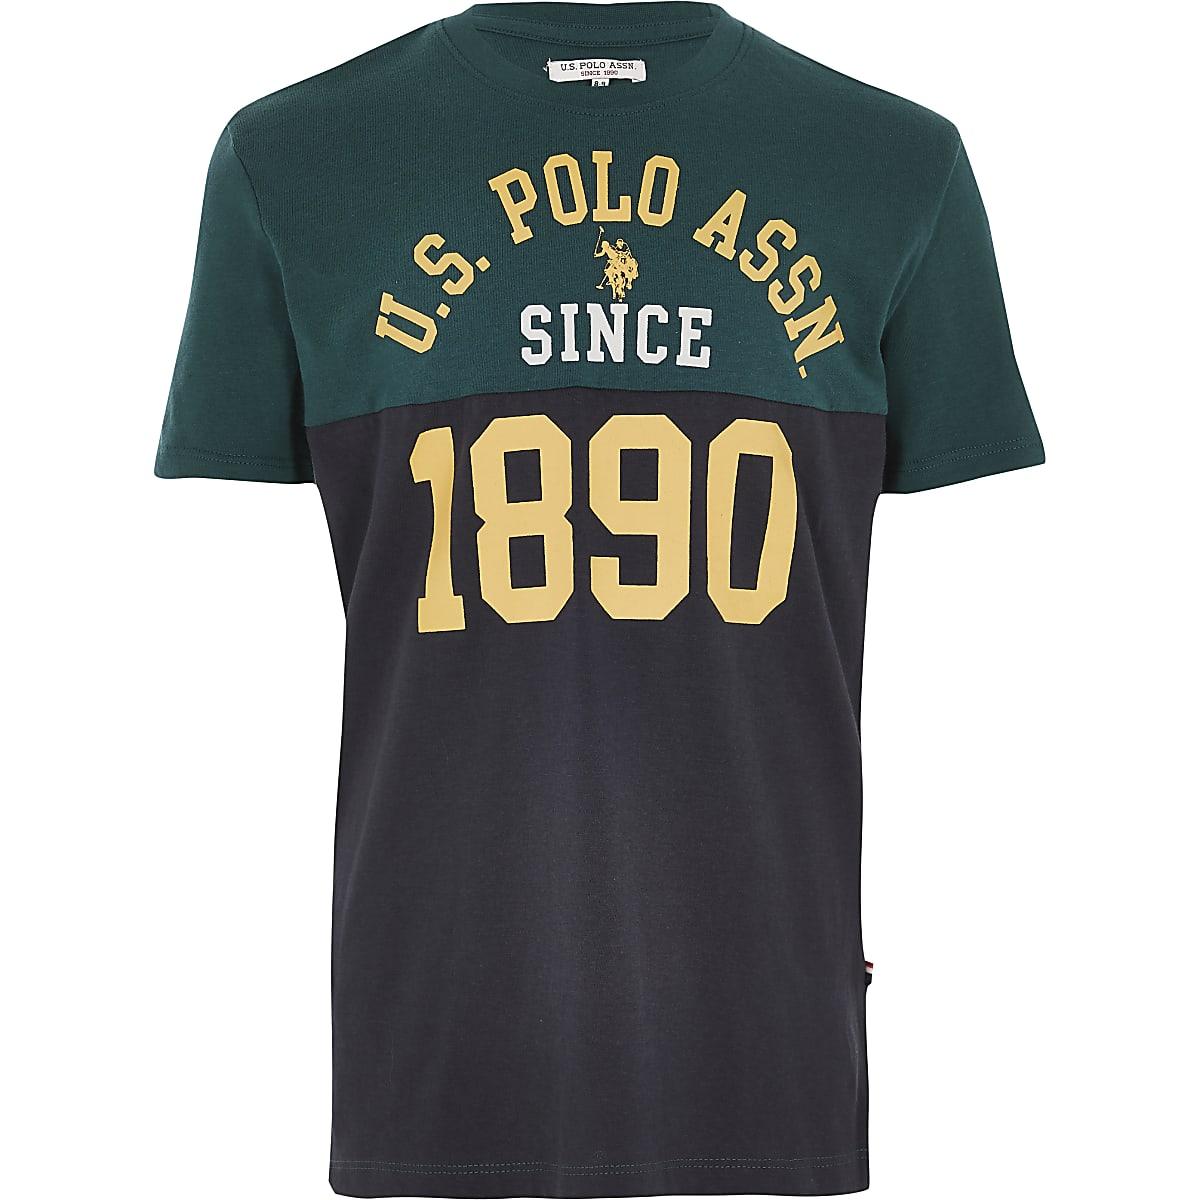 Boys U.S. Polo Assn. navy blocked T-shirt